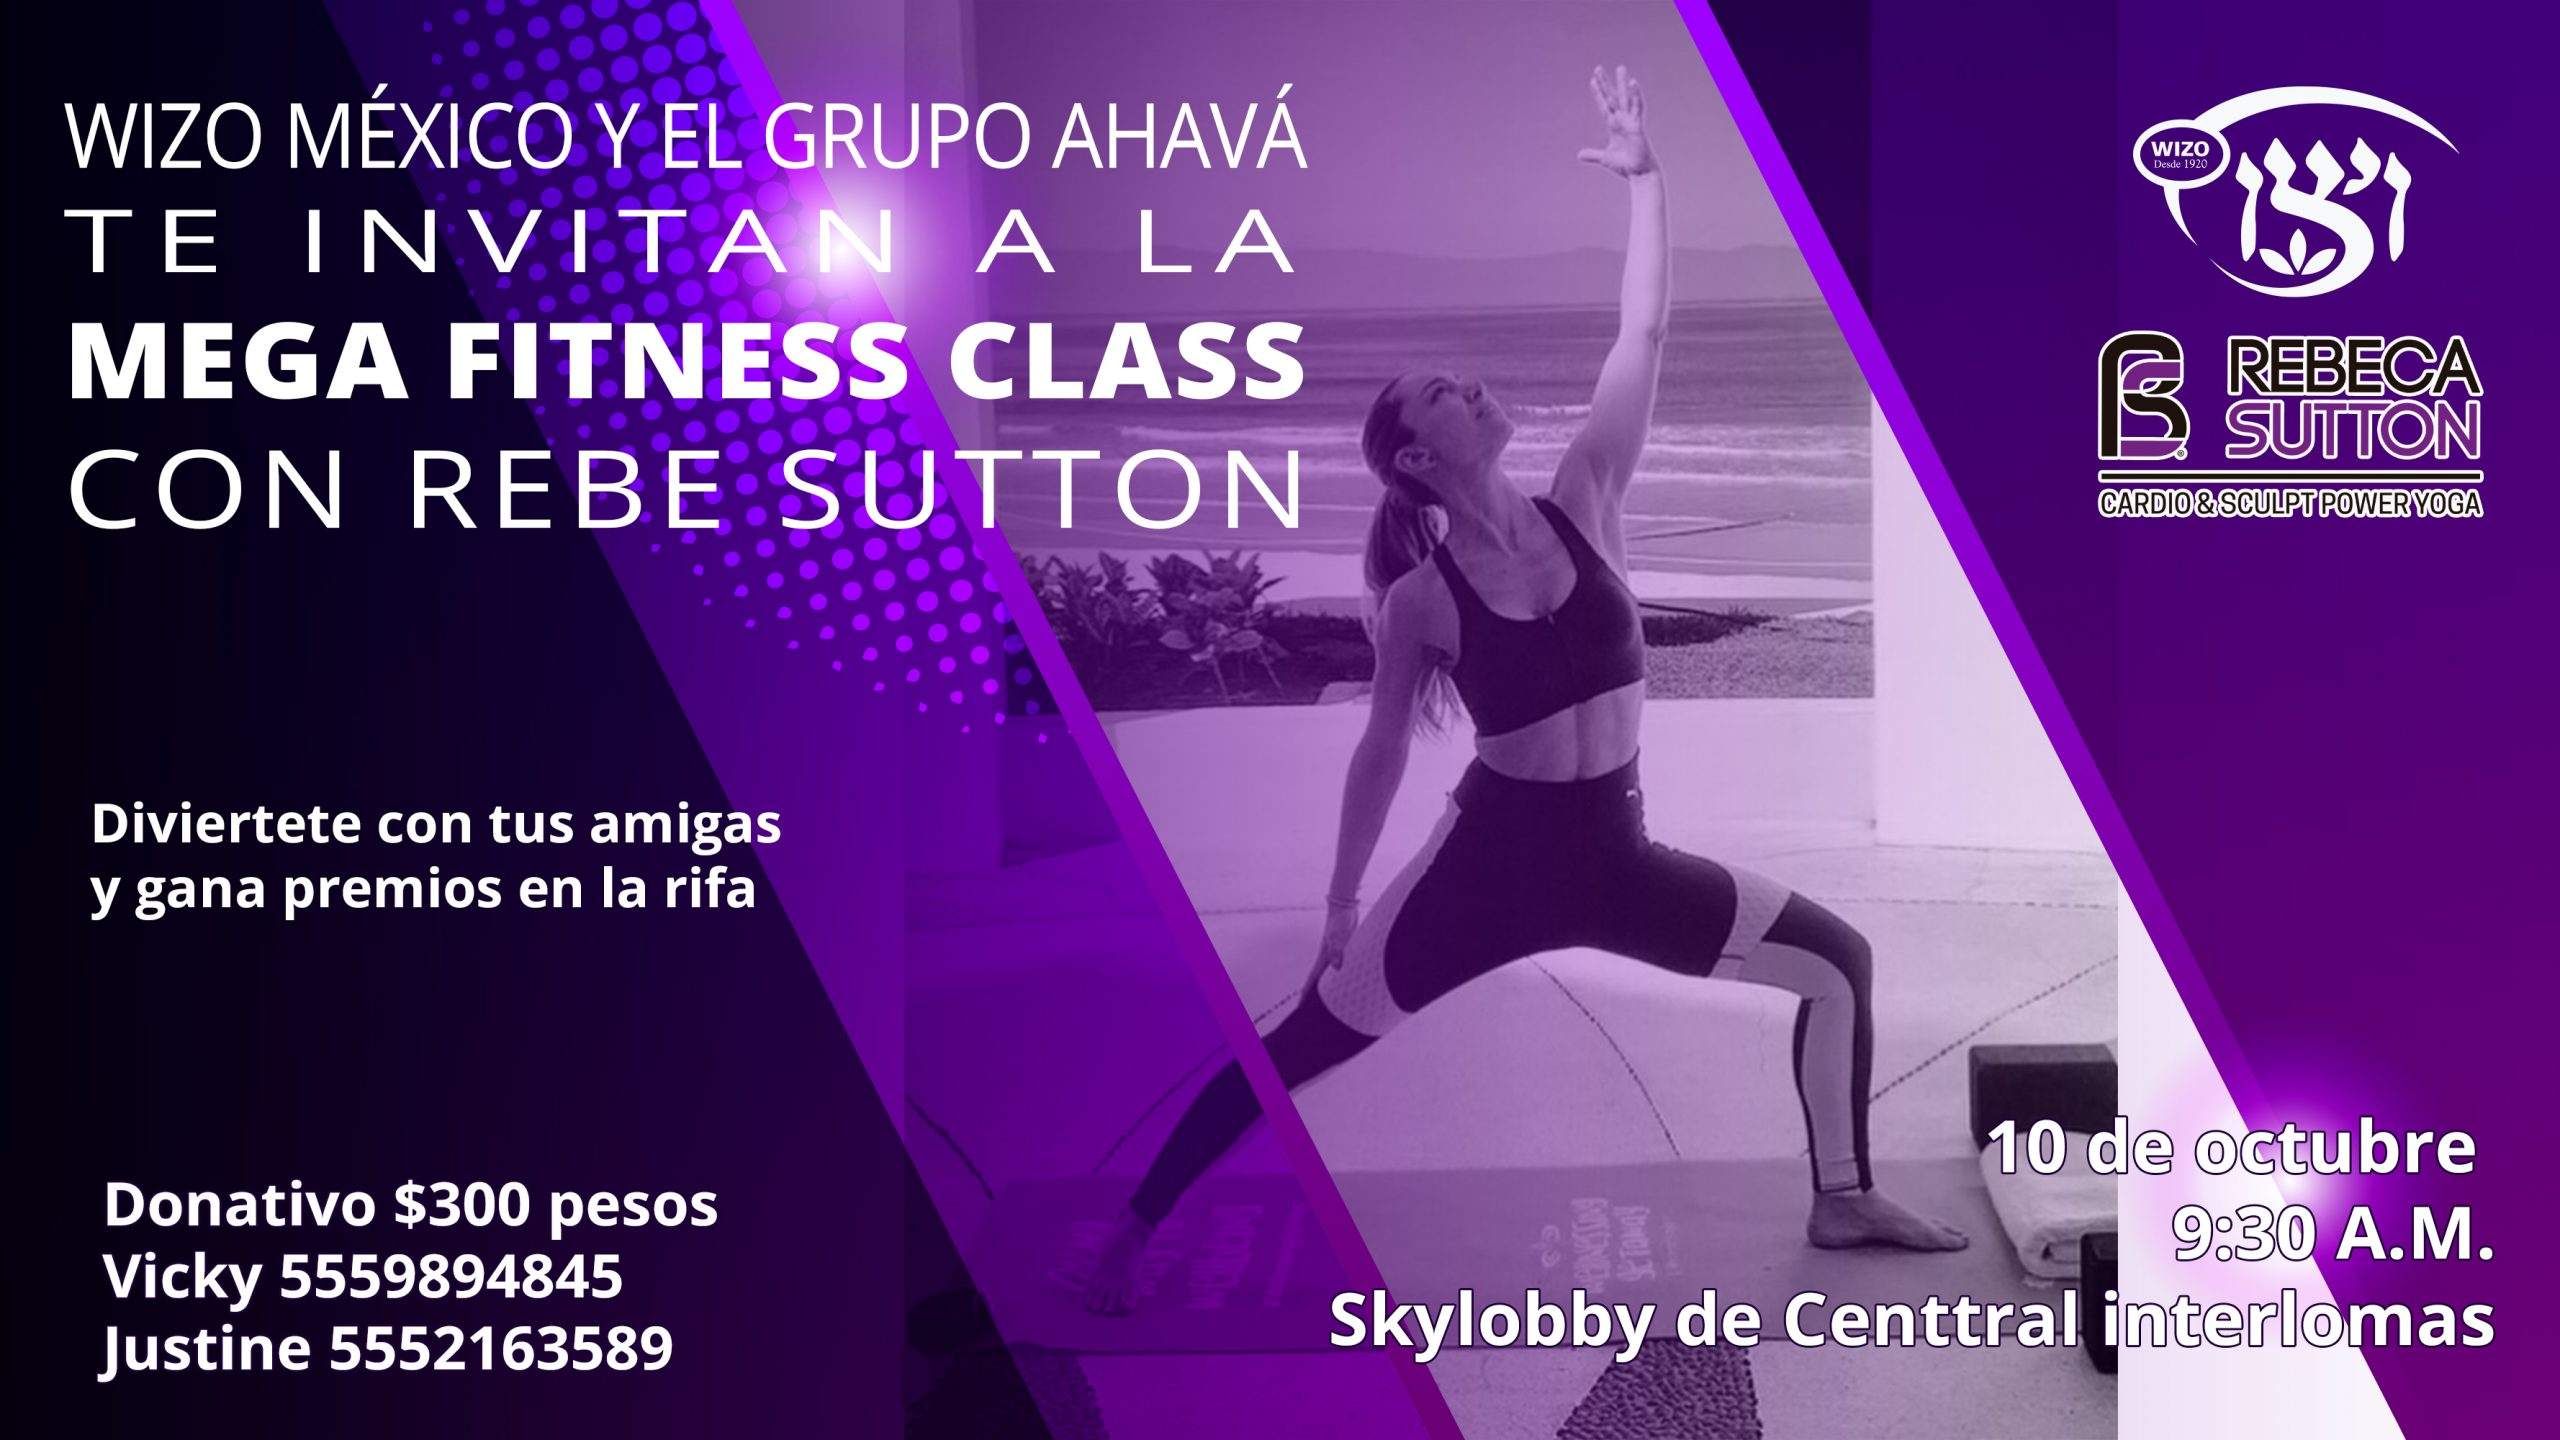 Mega Fitness Class